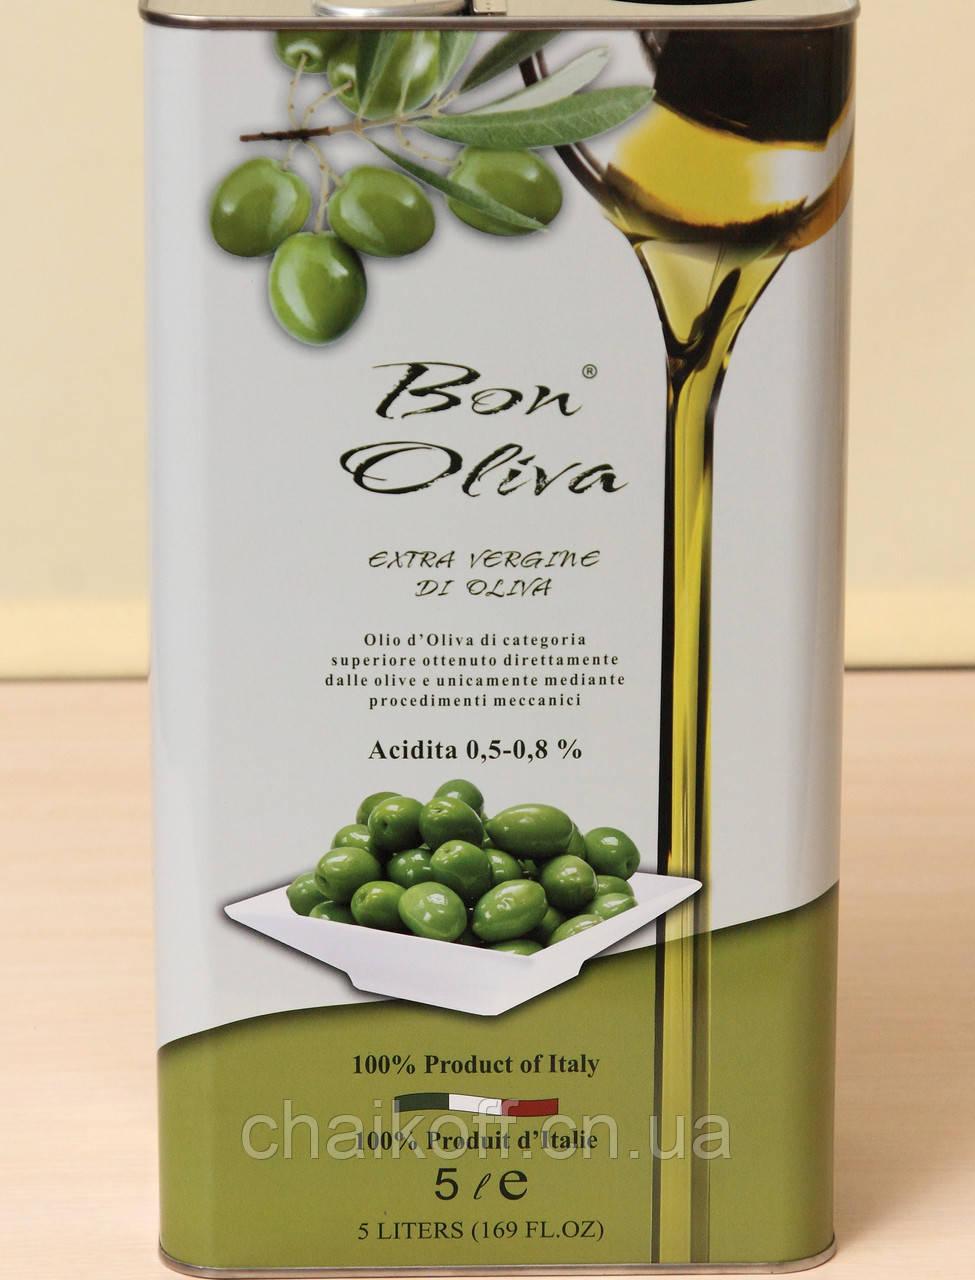 Оливковое масло Bon Oliva Extra Vergine Di Oliva 5l (шт.)